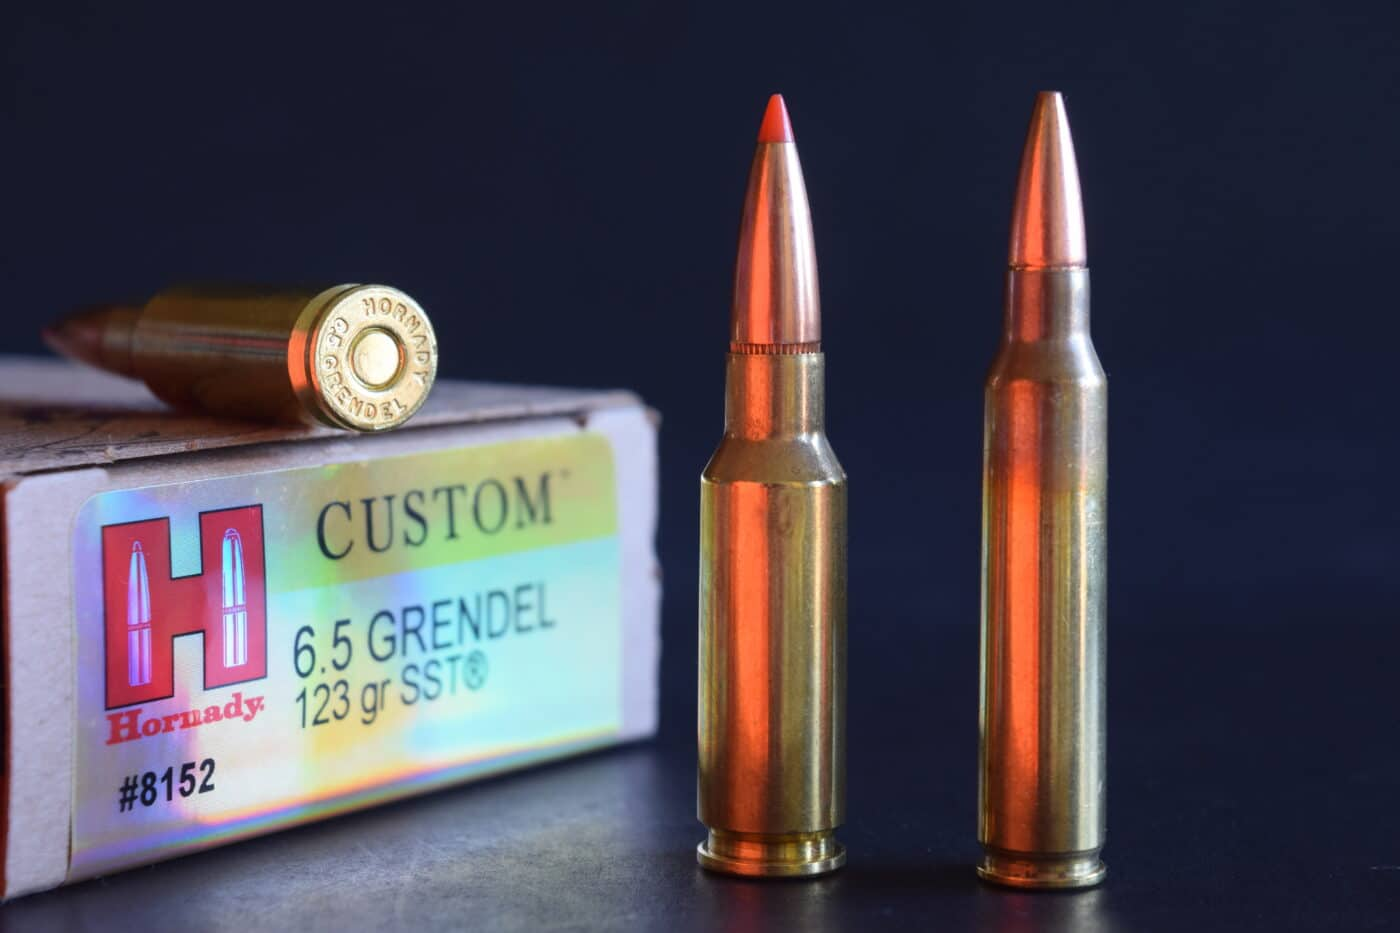 6.5 Grendel ammo for deer hunting